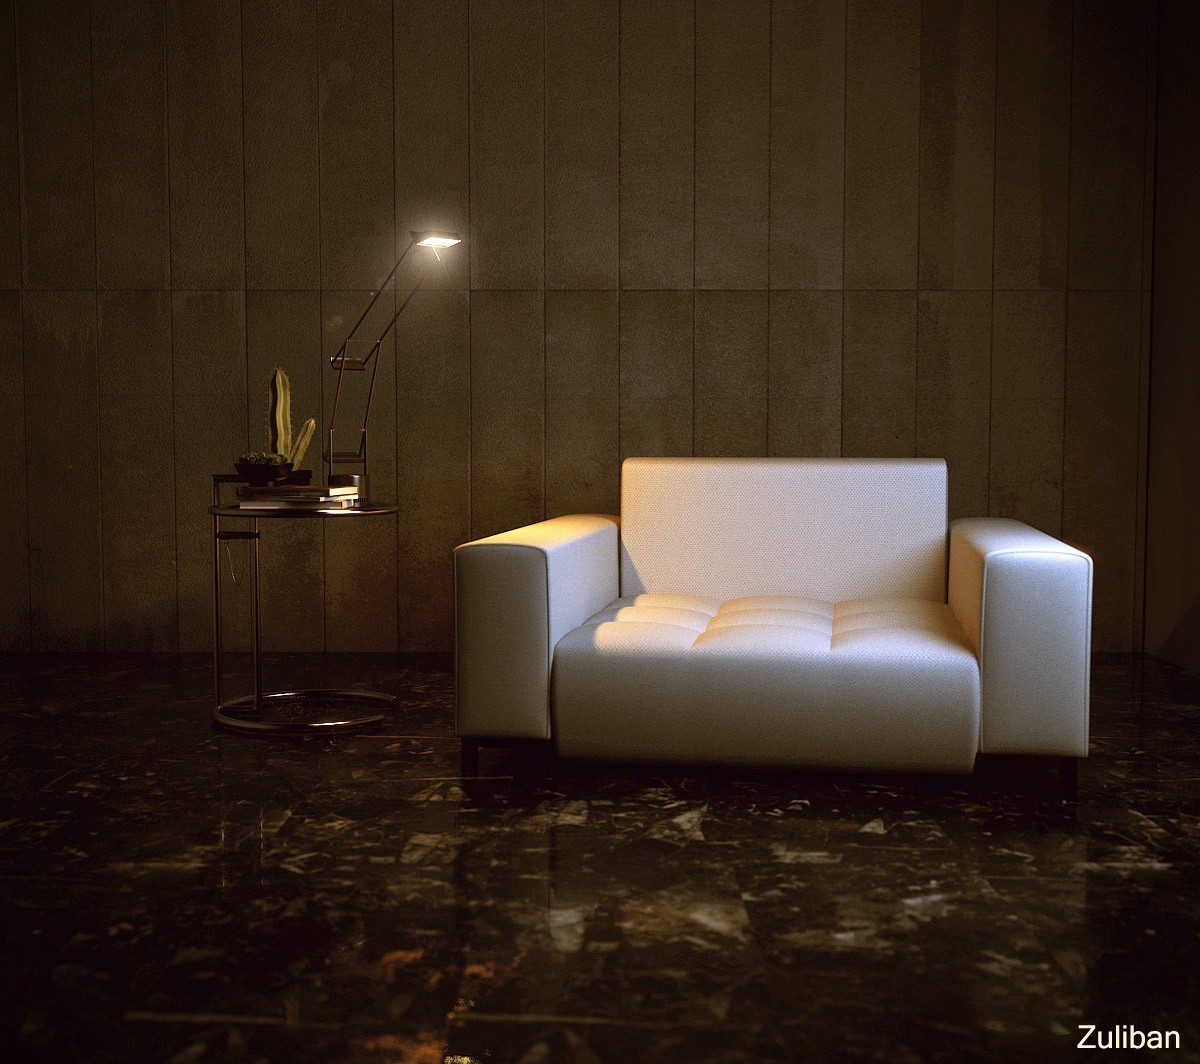 Zuliban sofa showroom 1 ee94e61f wb04